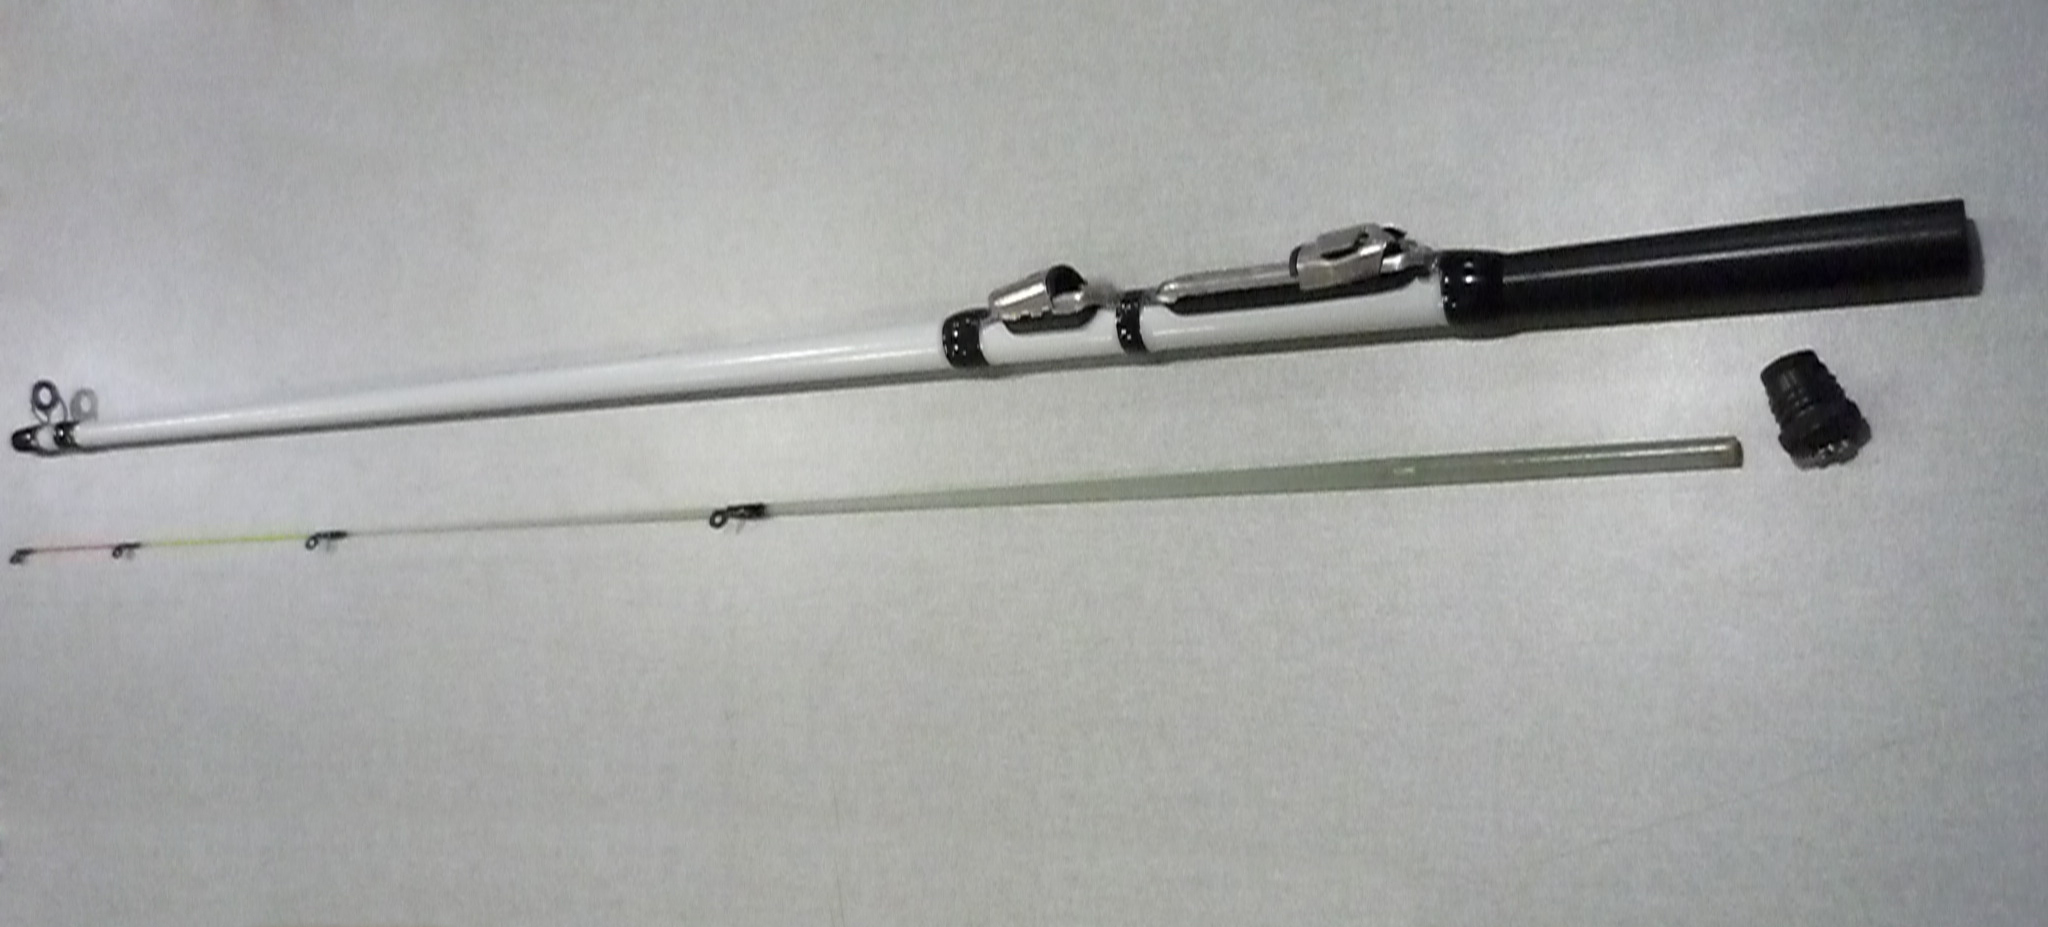 Удочка Trout Pro Ice Master QL-204